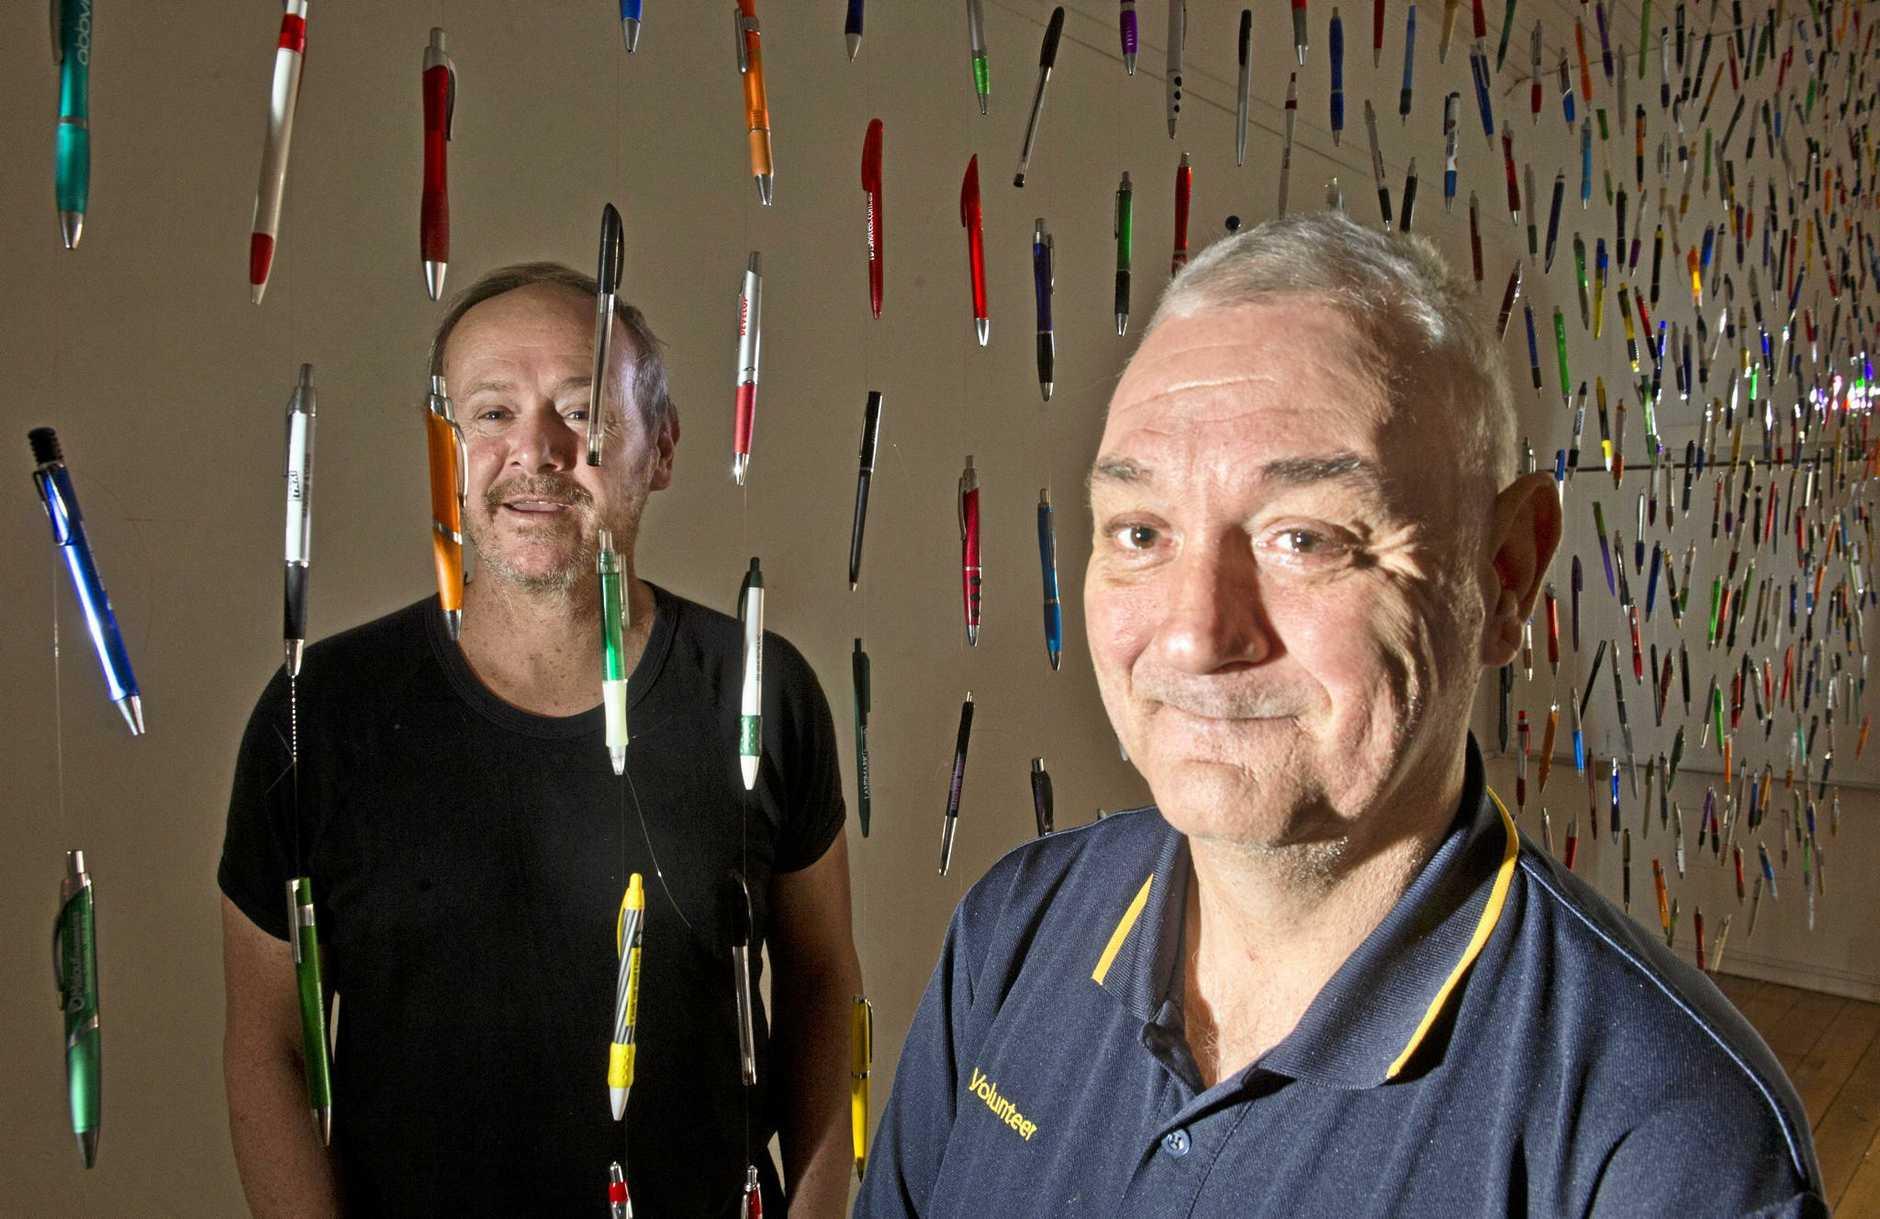 UNIQUE DISPLAY: Artist Sean Humphreys (left) and Steven Wooldridge at Alizarin + C Gallery in Margaret St.